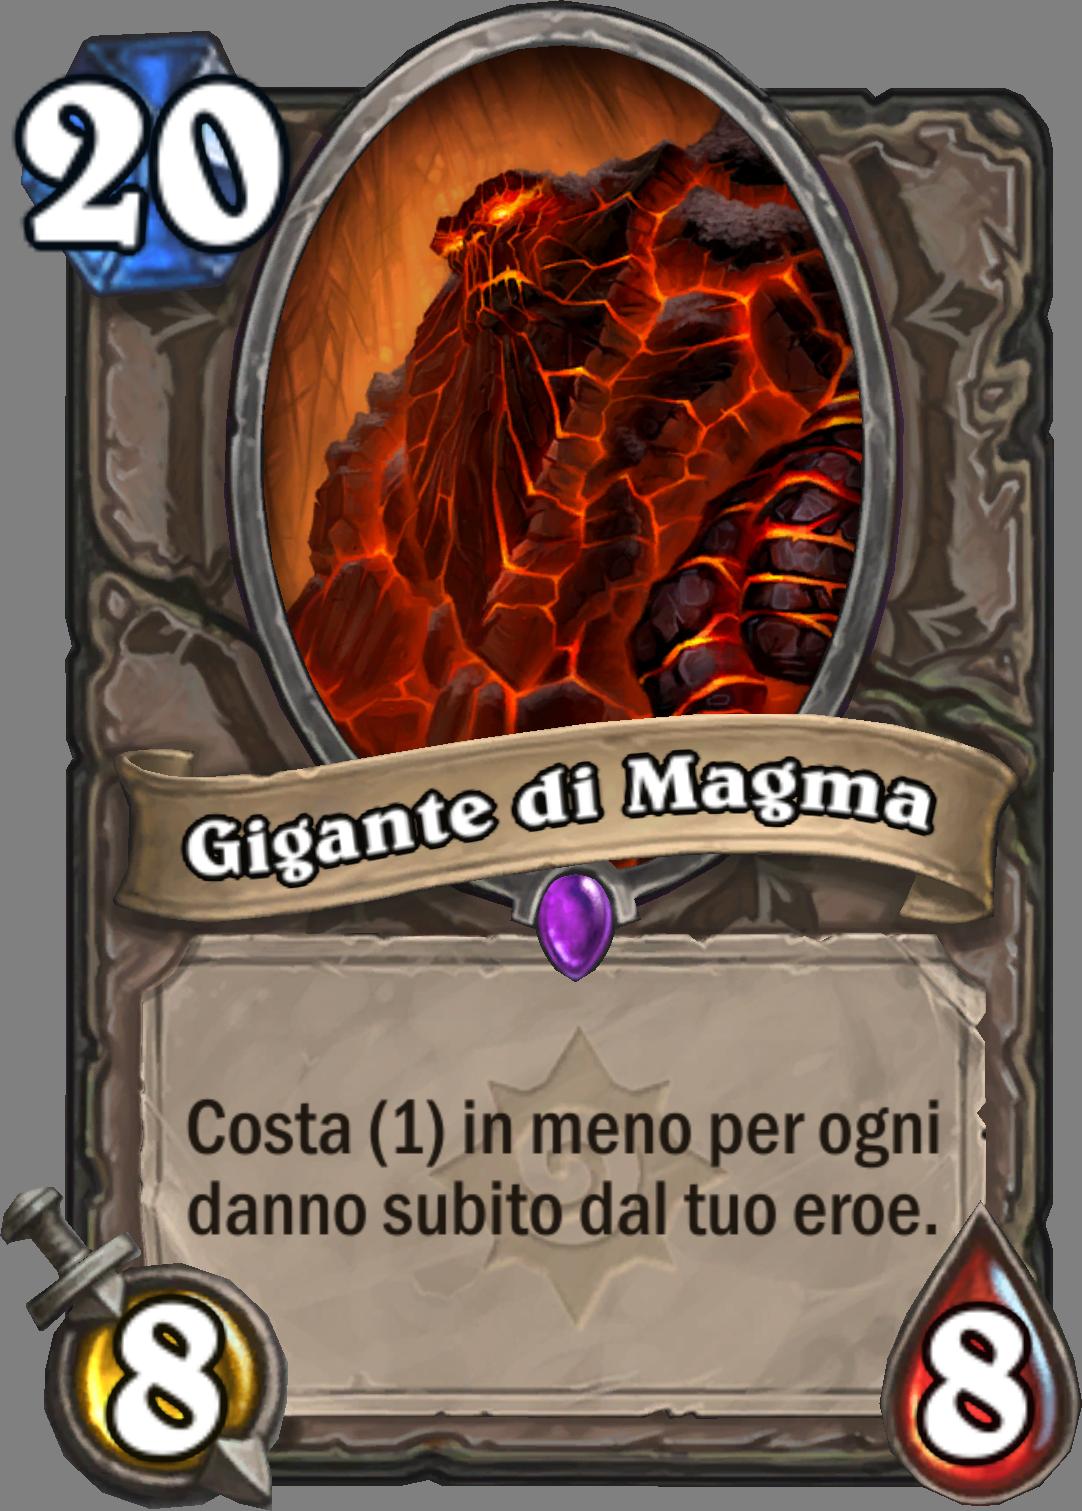 Gigante di Magma